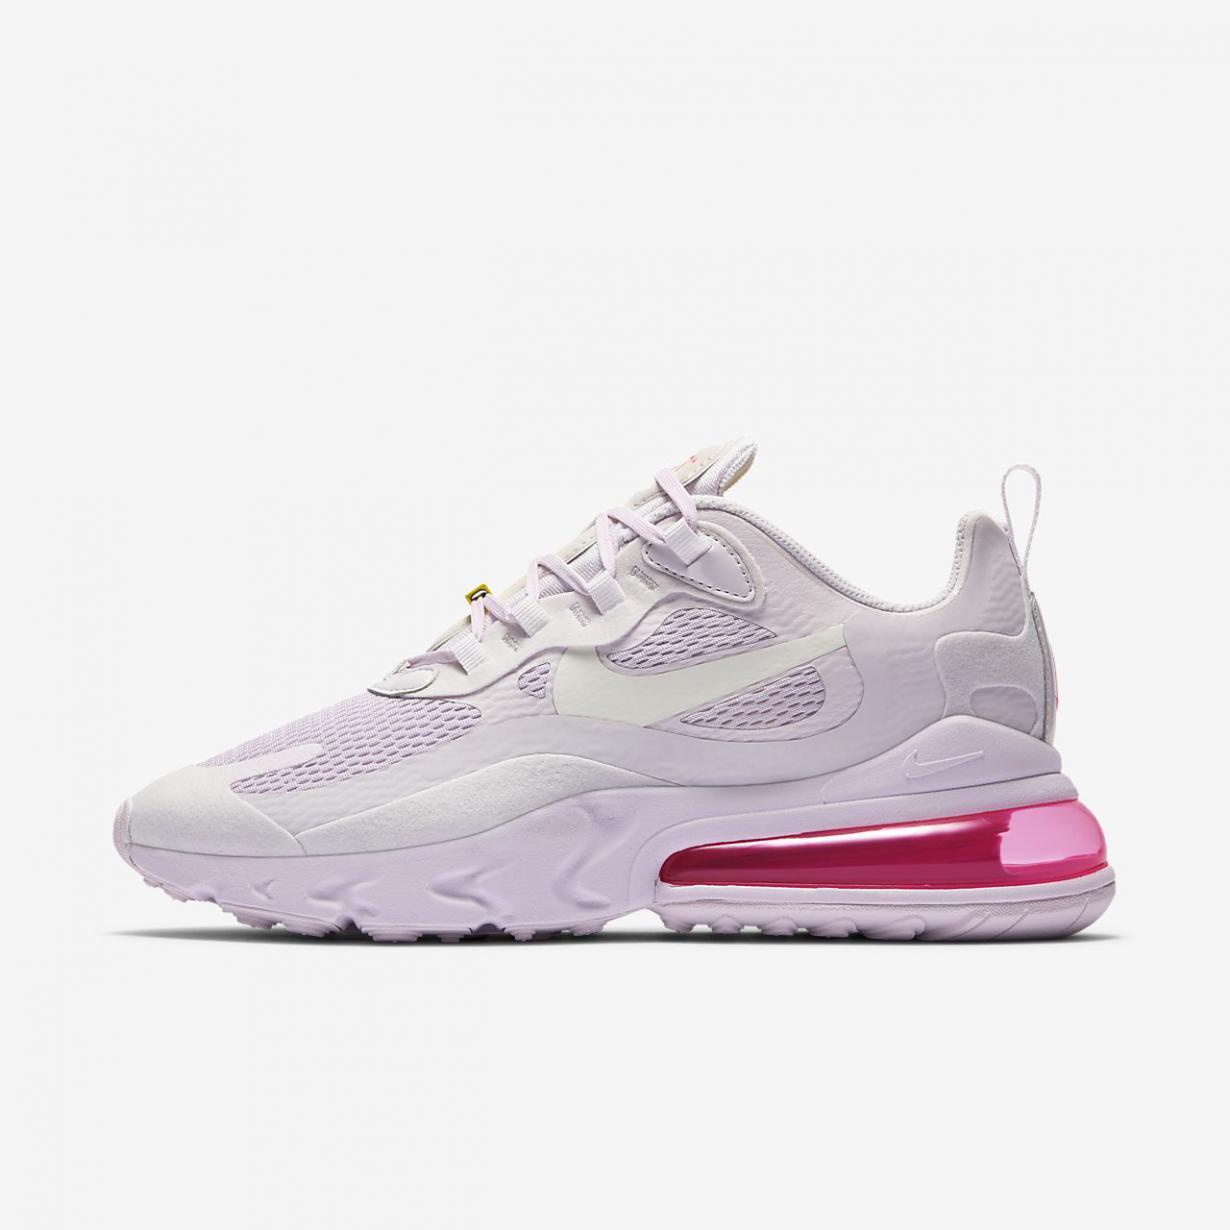 Lifestyle Femme | Air Max 270 React Violet clair/Jaune franc/Rose numérique/Voile | Nike < Gooddaytricities